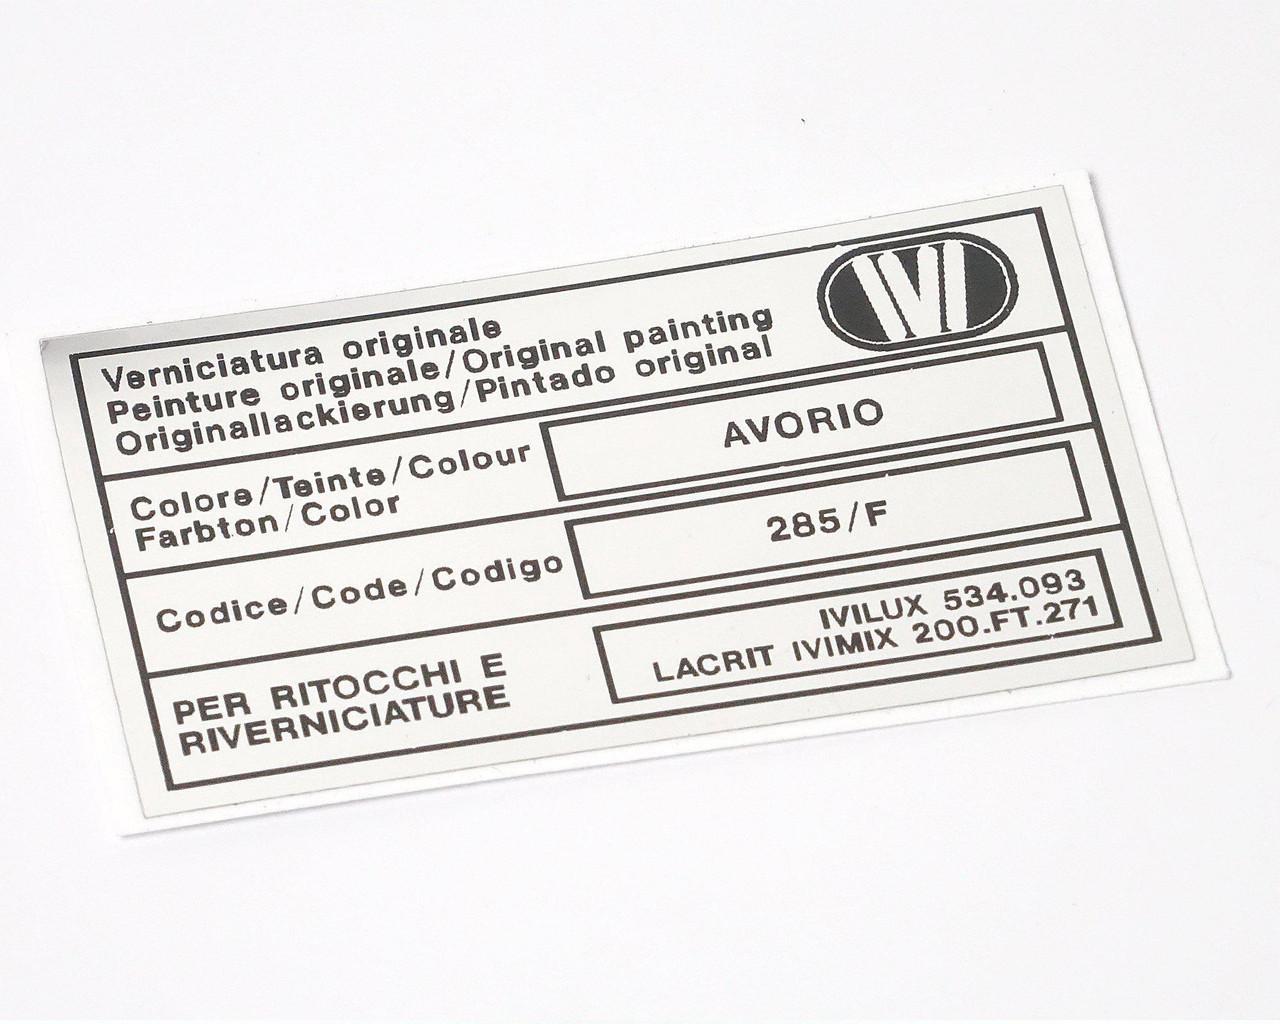 Paint Code Decal - IVI - Avorio (Ivory)